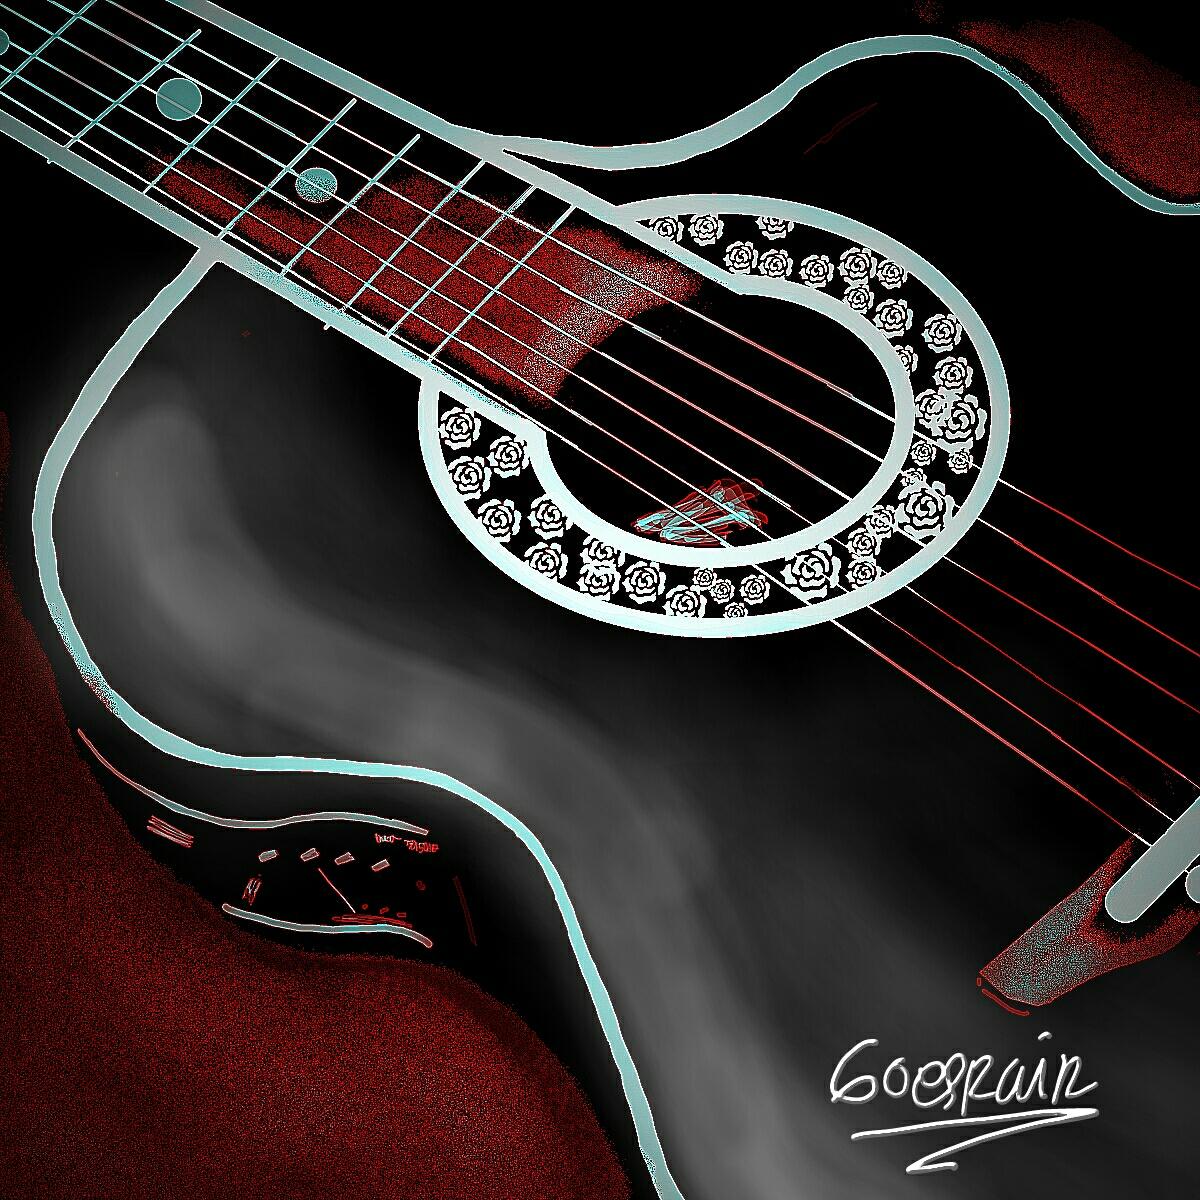 Guitar Tumblr Drawing Guitar Drawing Contest Winners